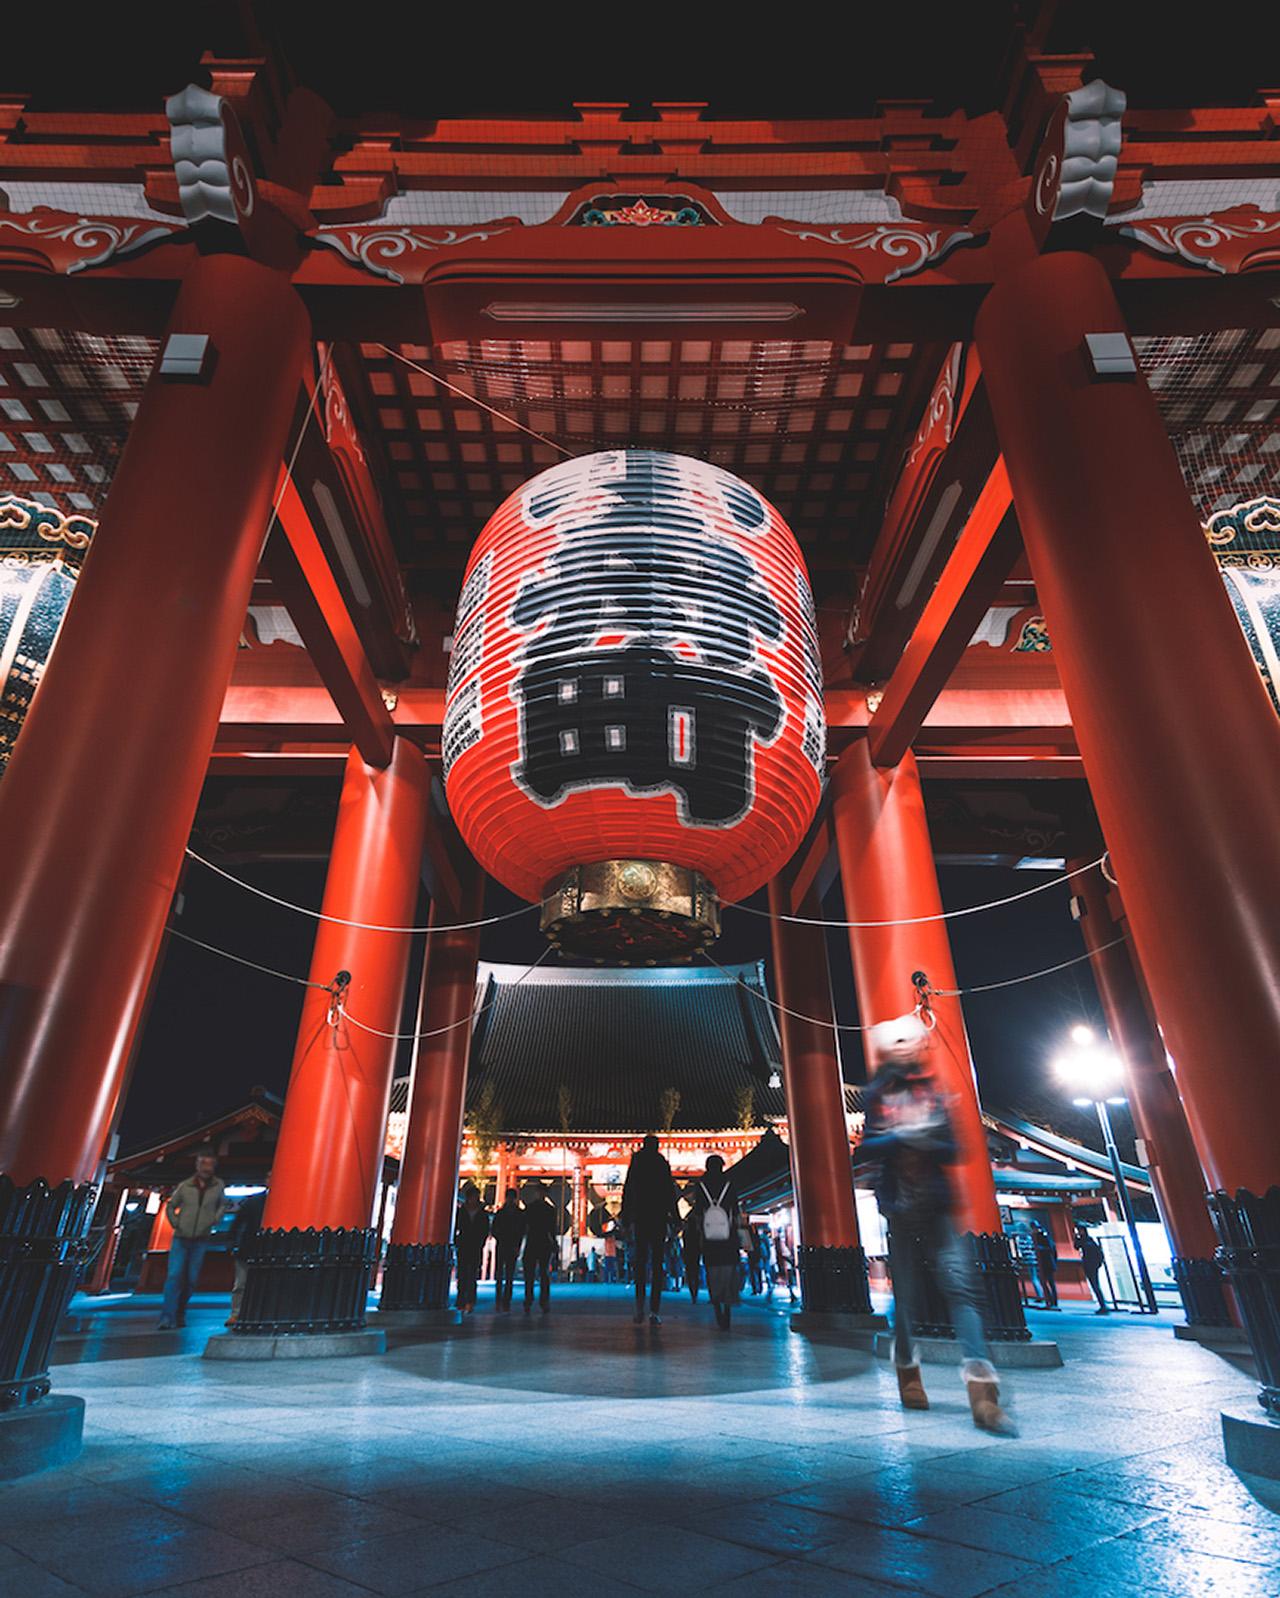 A short train ride takes you to Asakusa, where you can visit Tokyo's oldest temple, Sensō-ji.